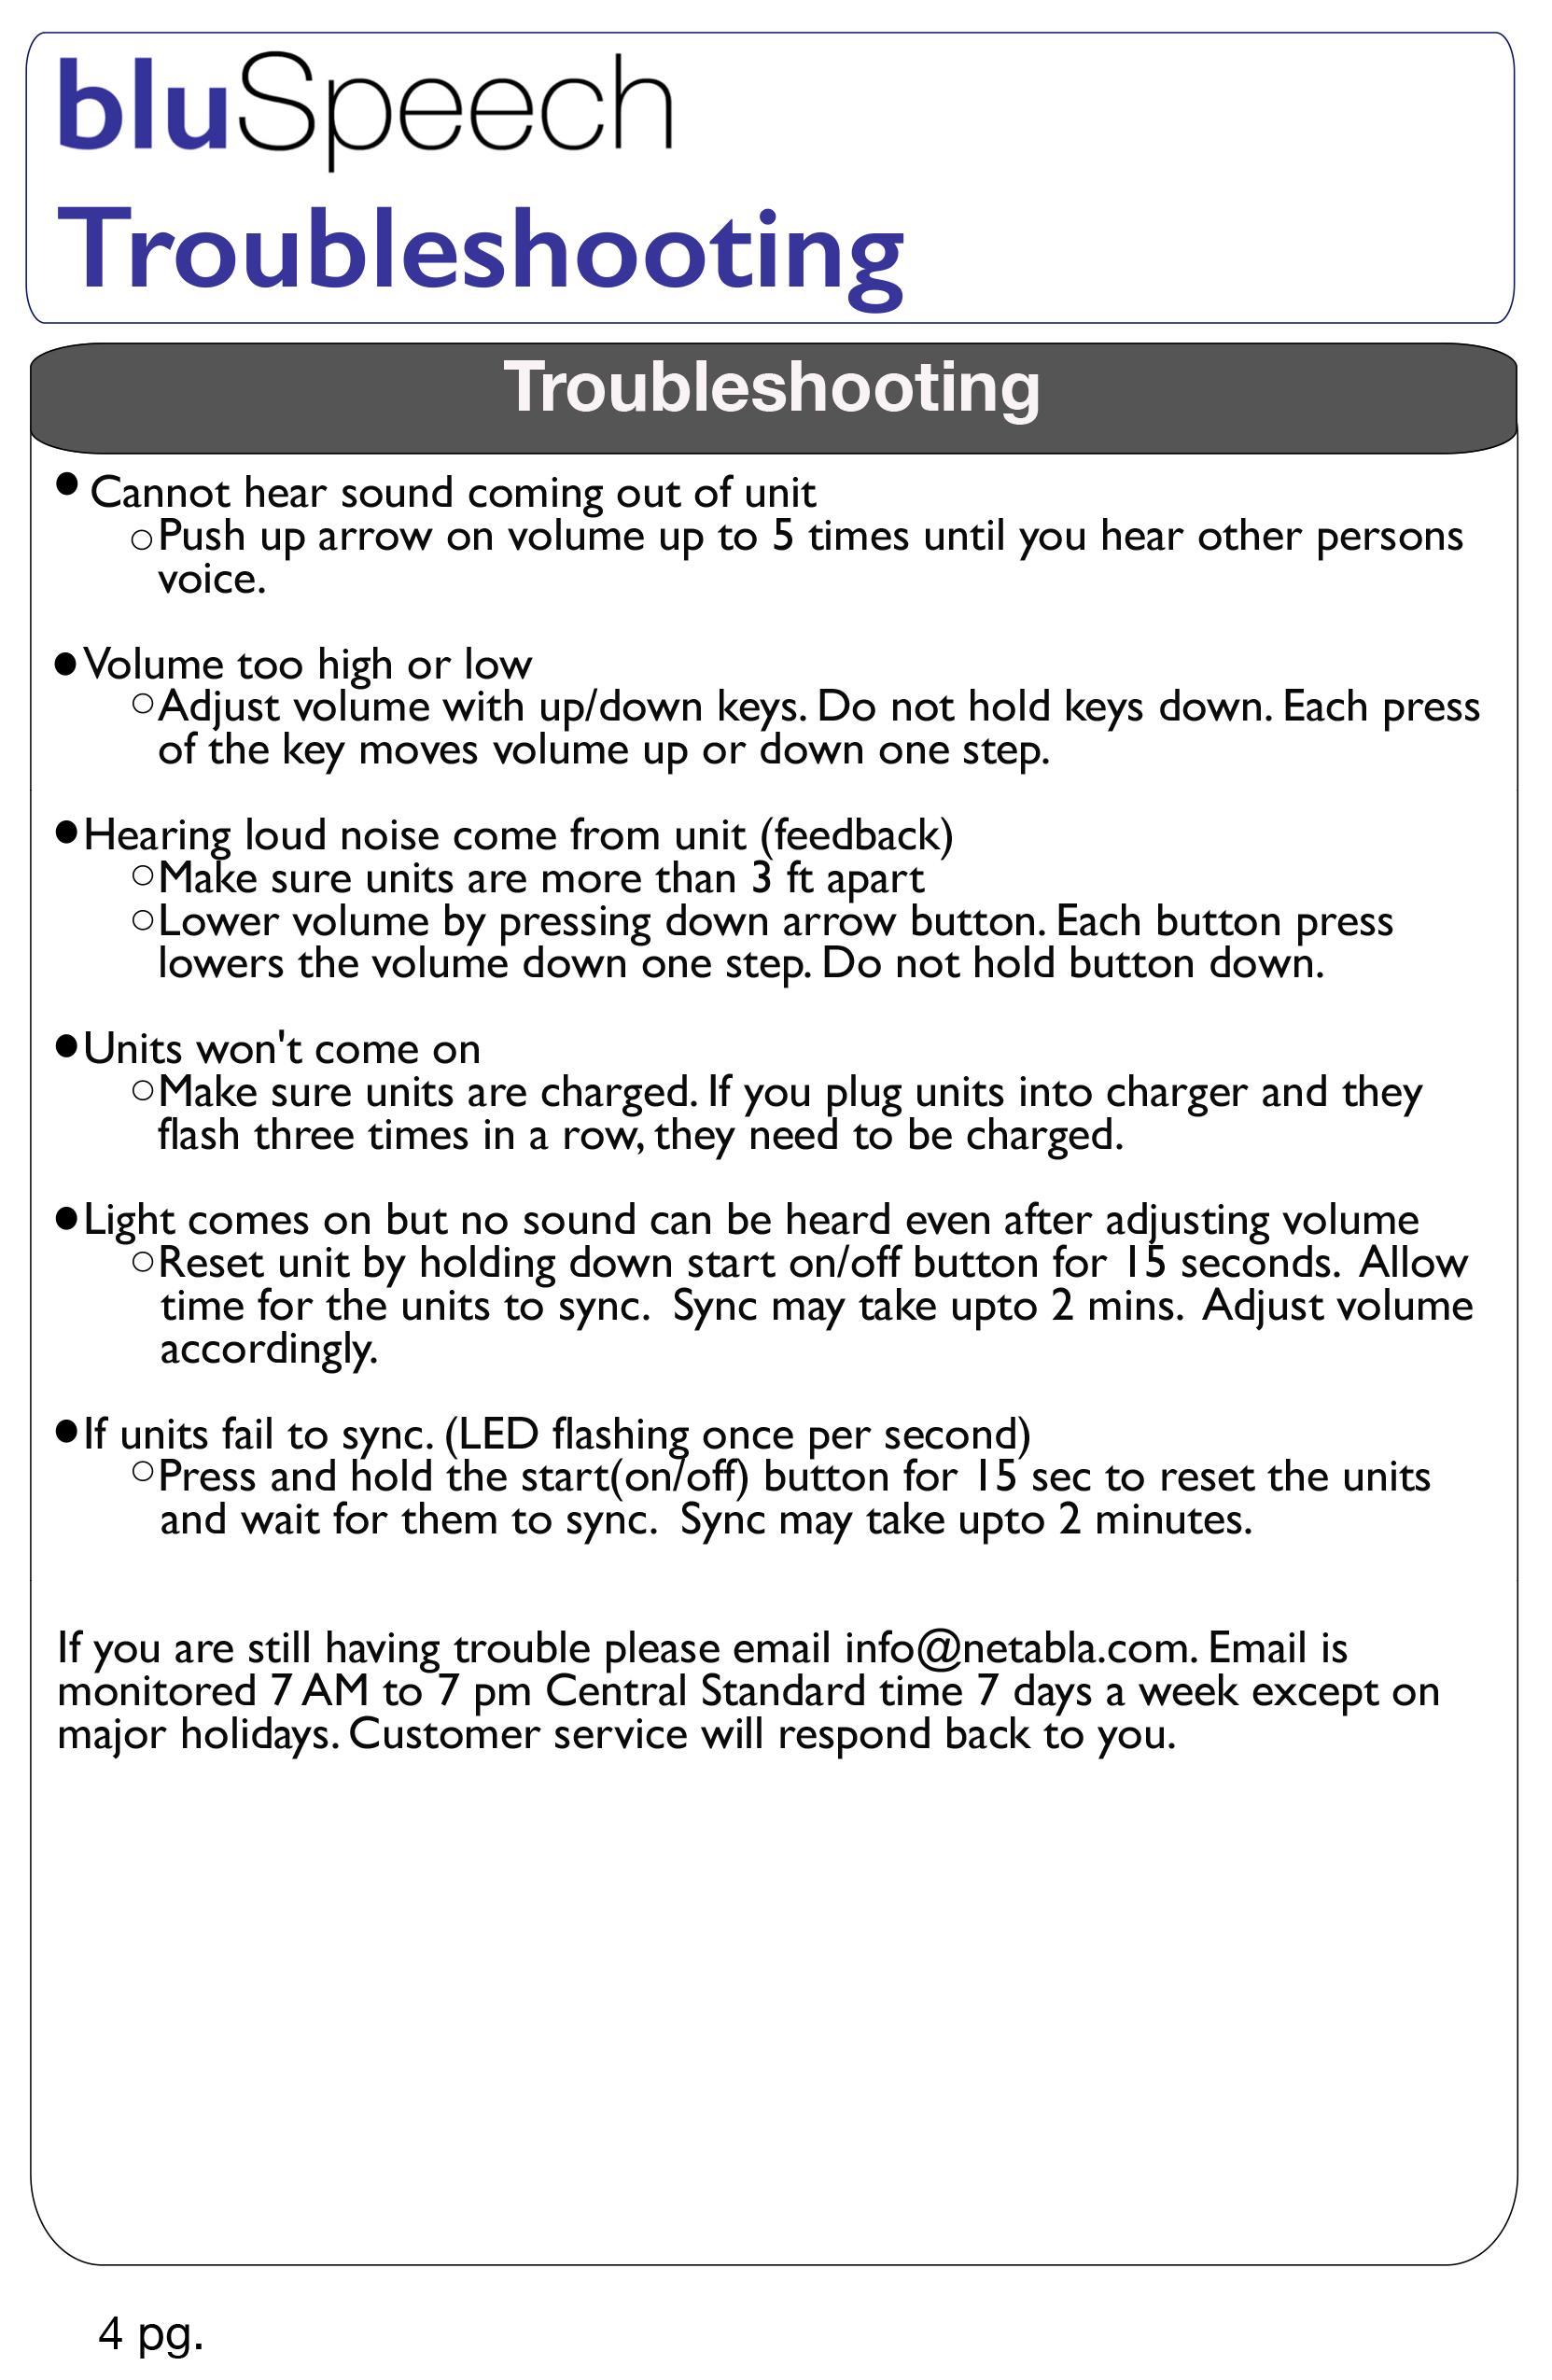 Manual pg 4.jpg